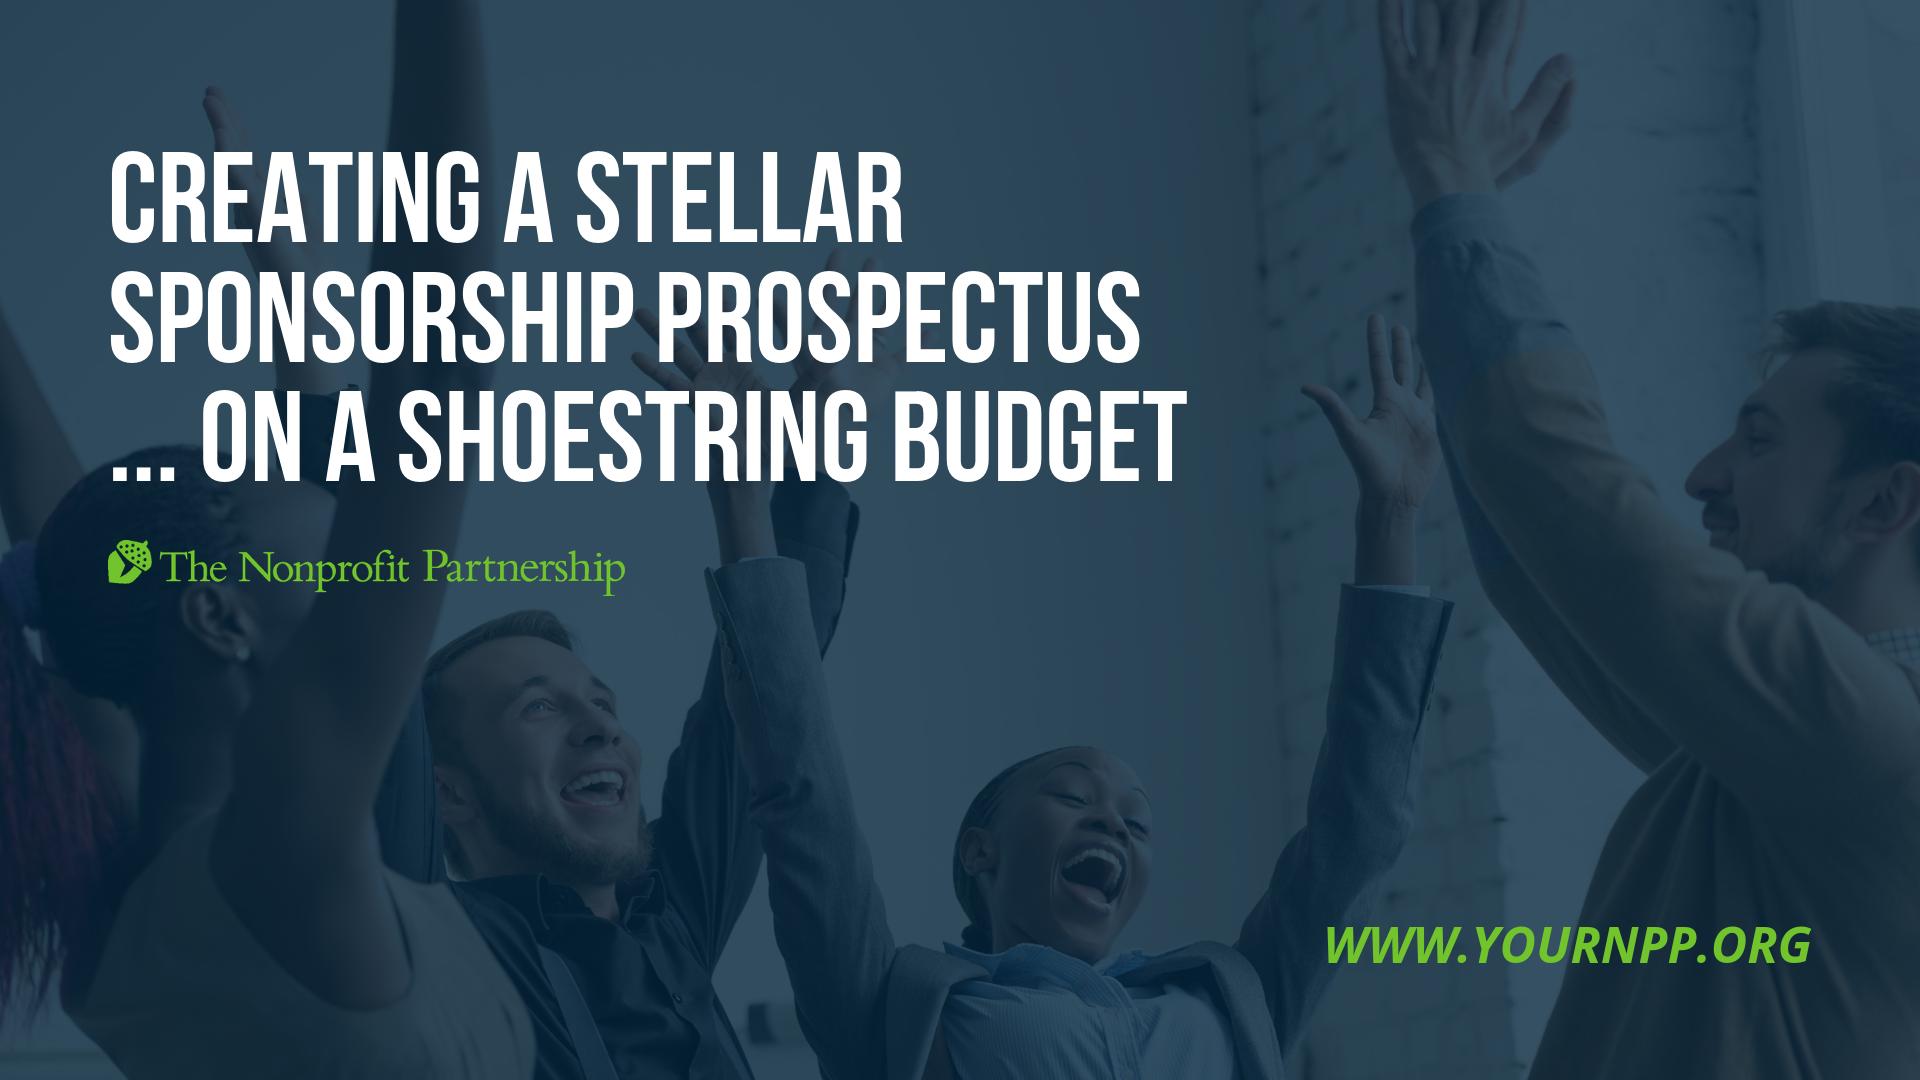 Creating a Stellar Sponsorship Prospectus... on a Shoestring Budget